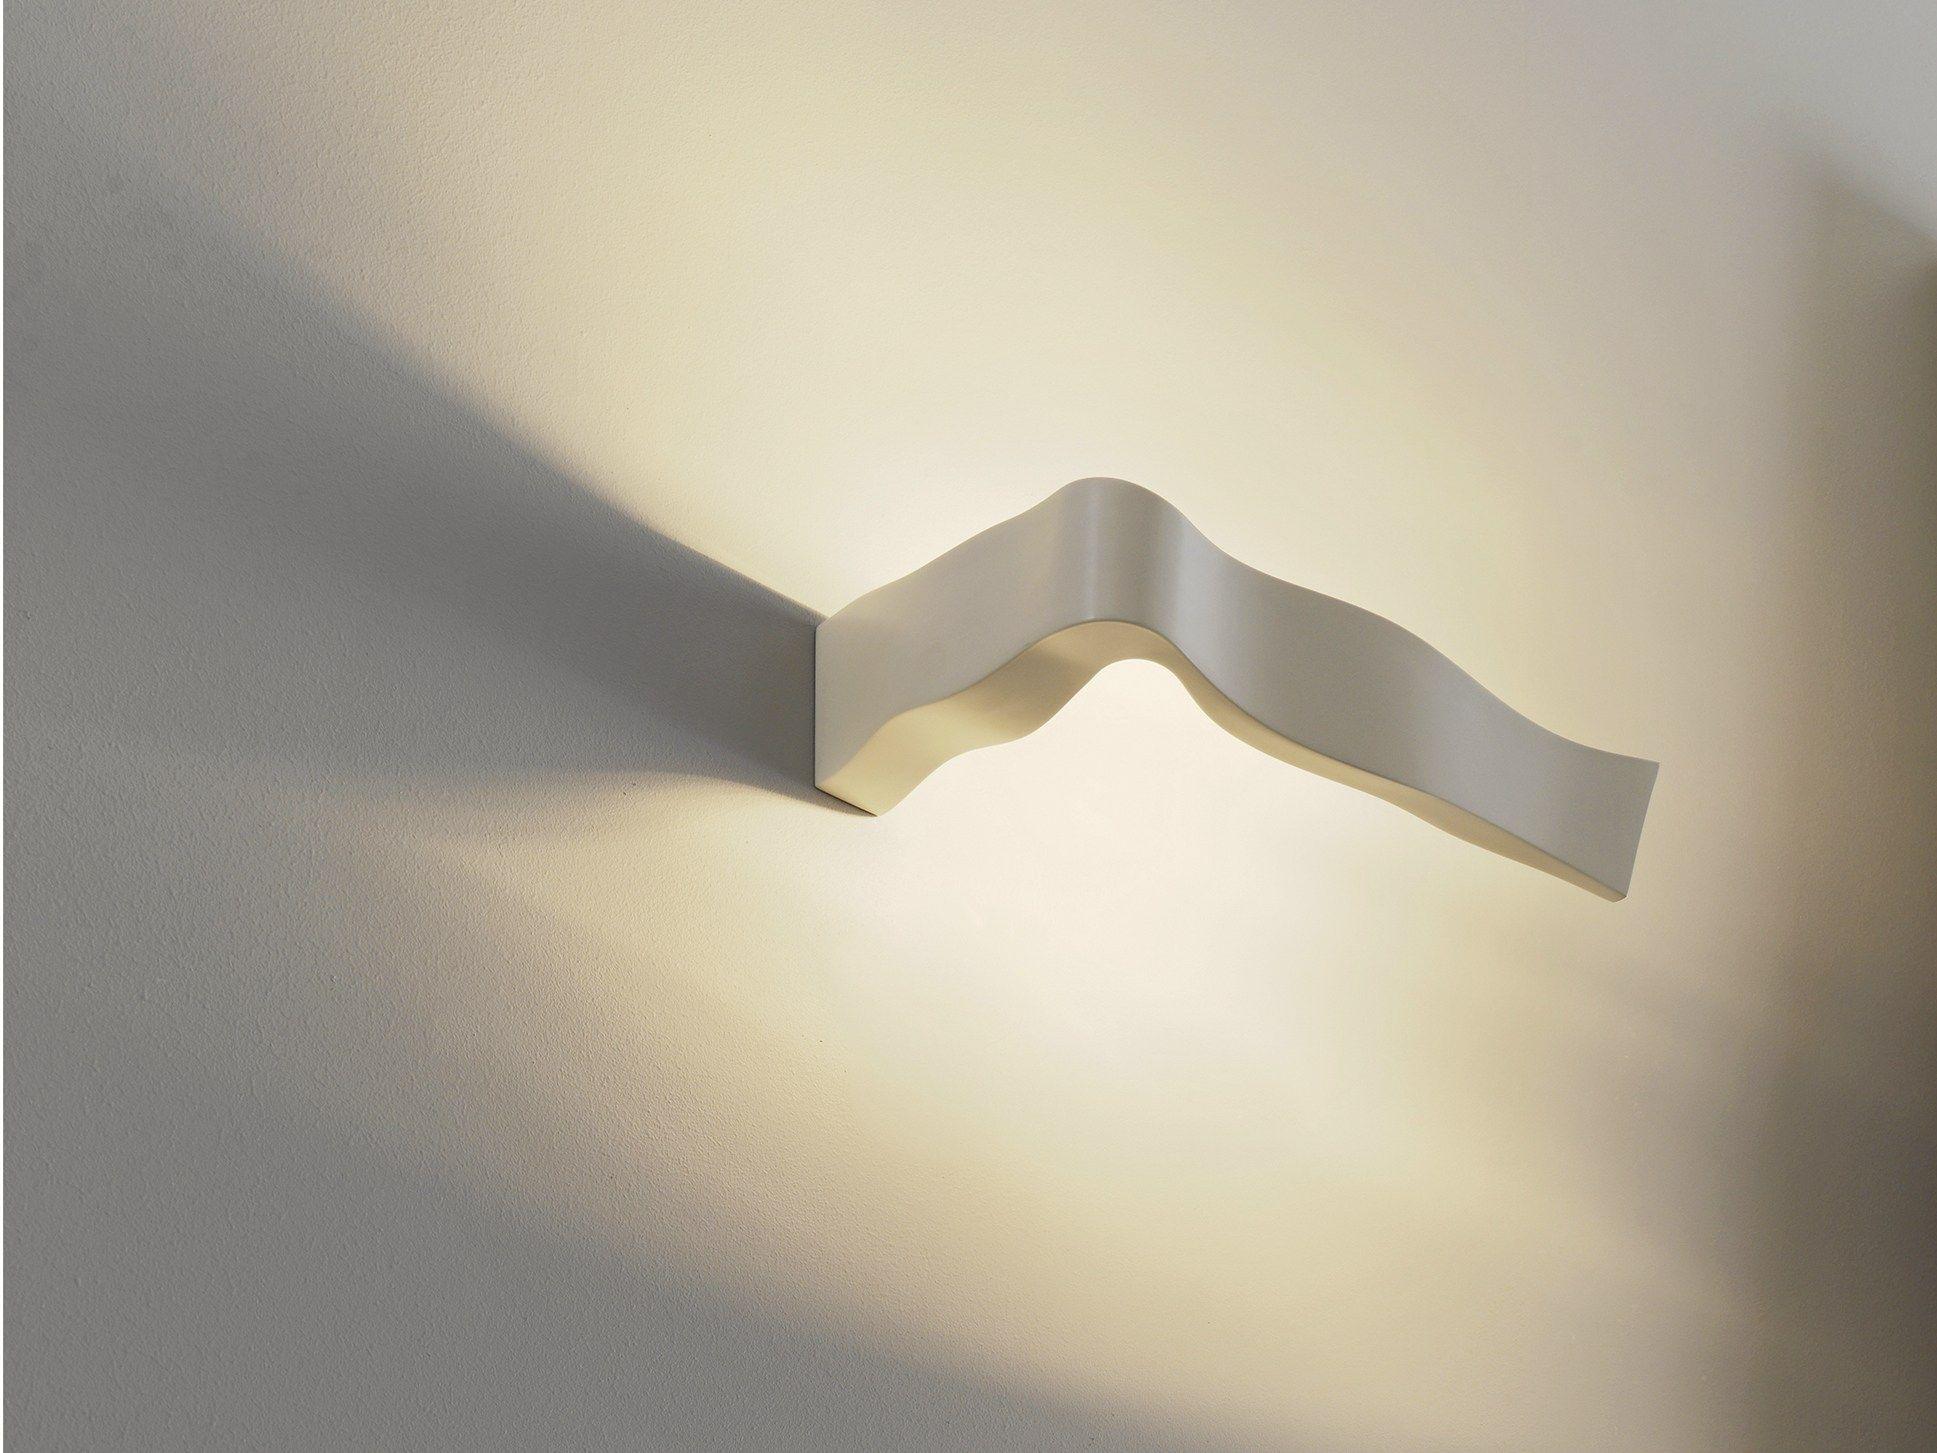 LED wall light IO By FontanaArte design Claesson Koivisto Rune